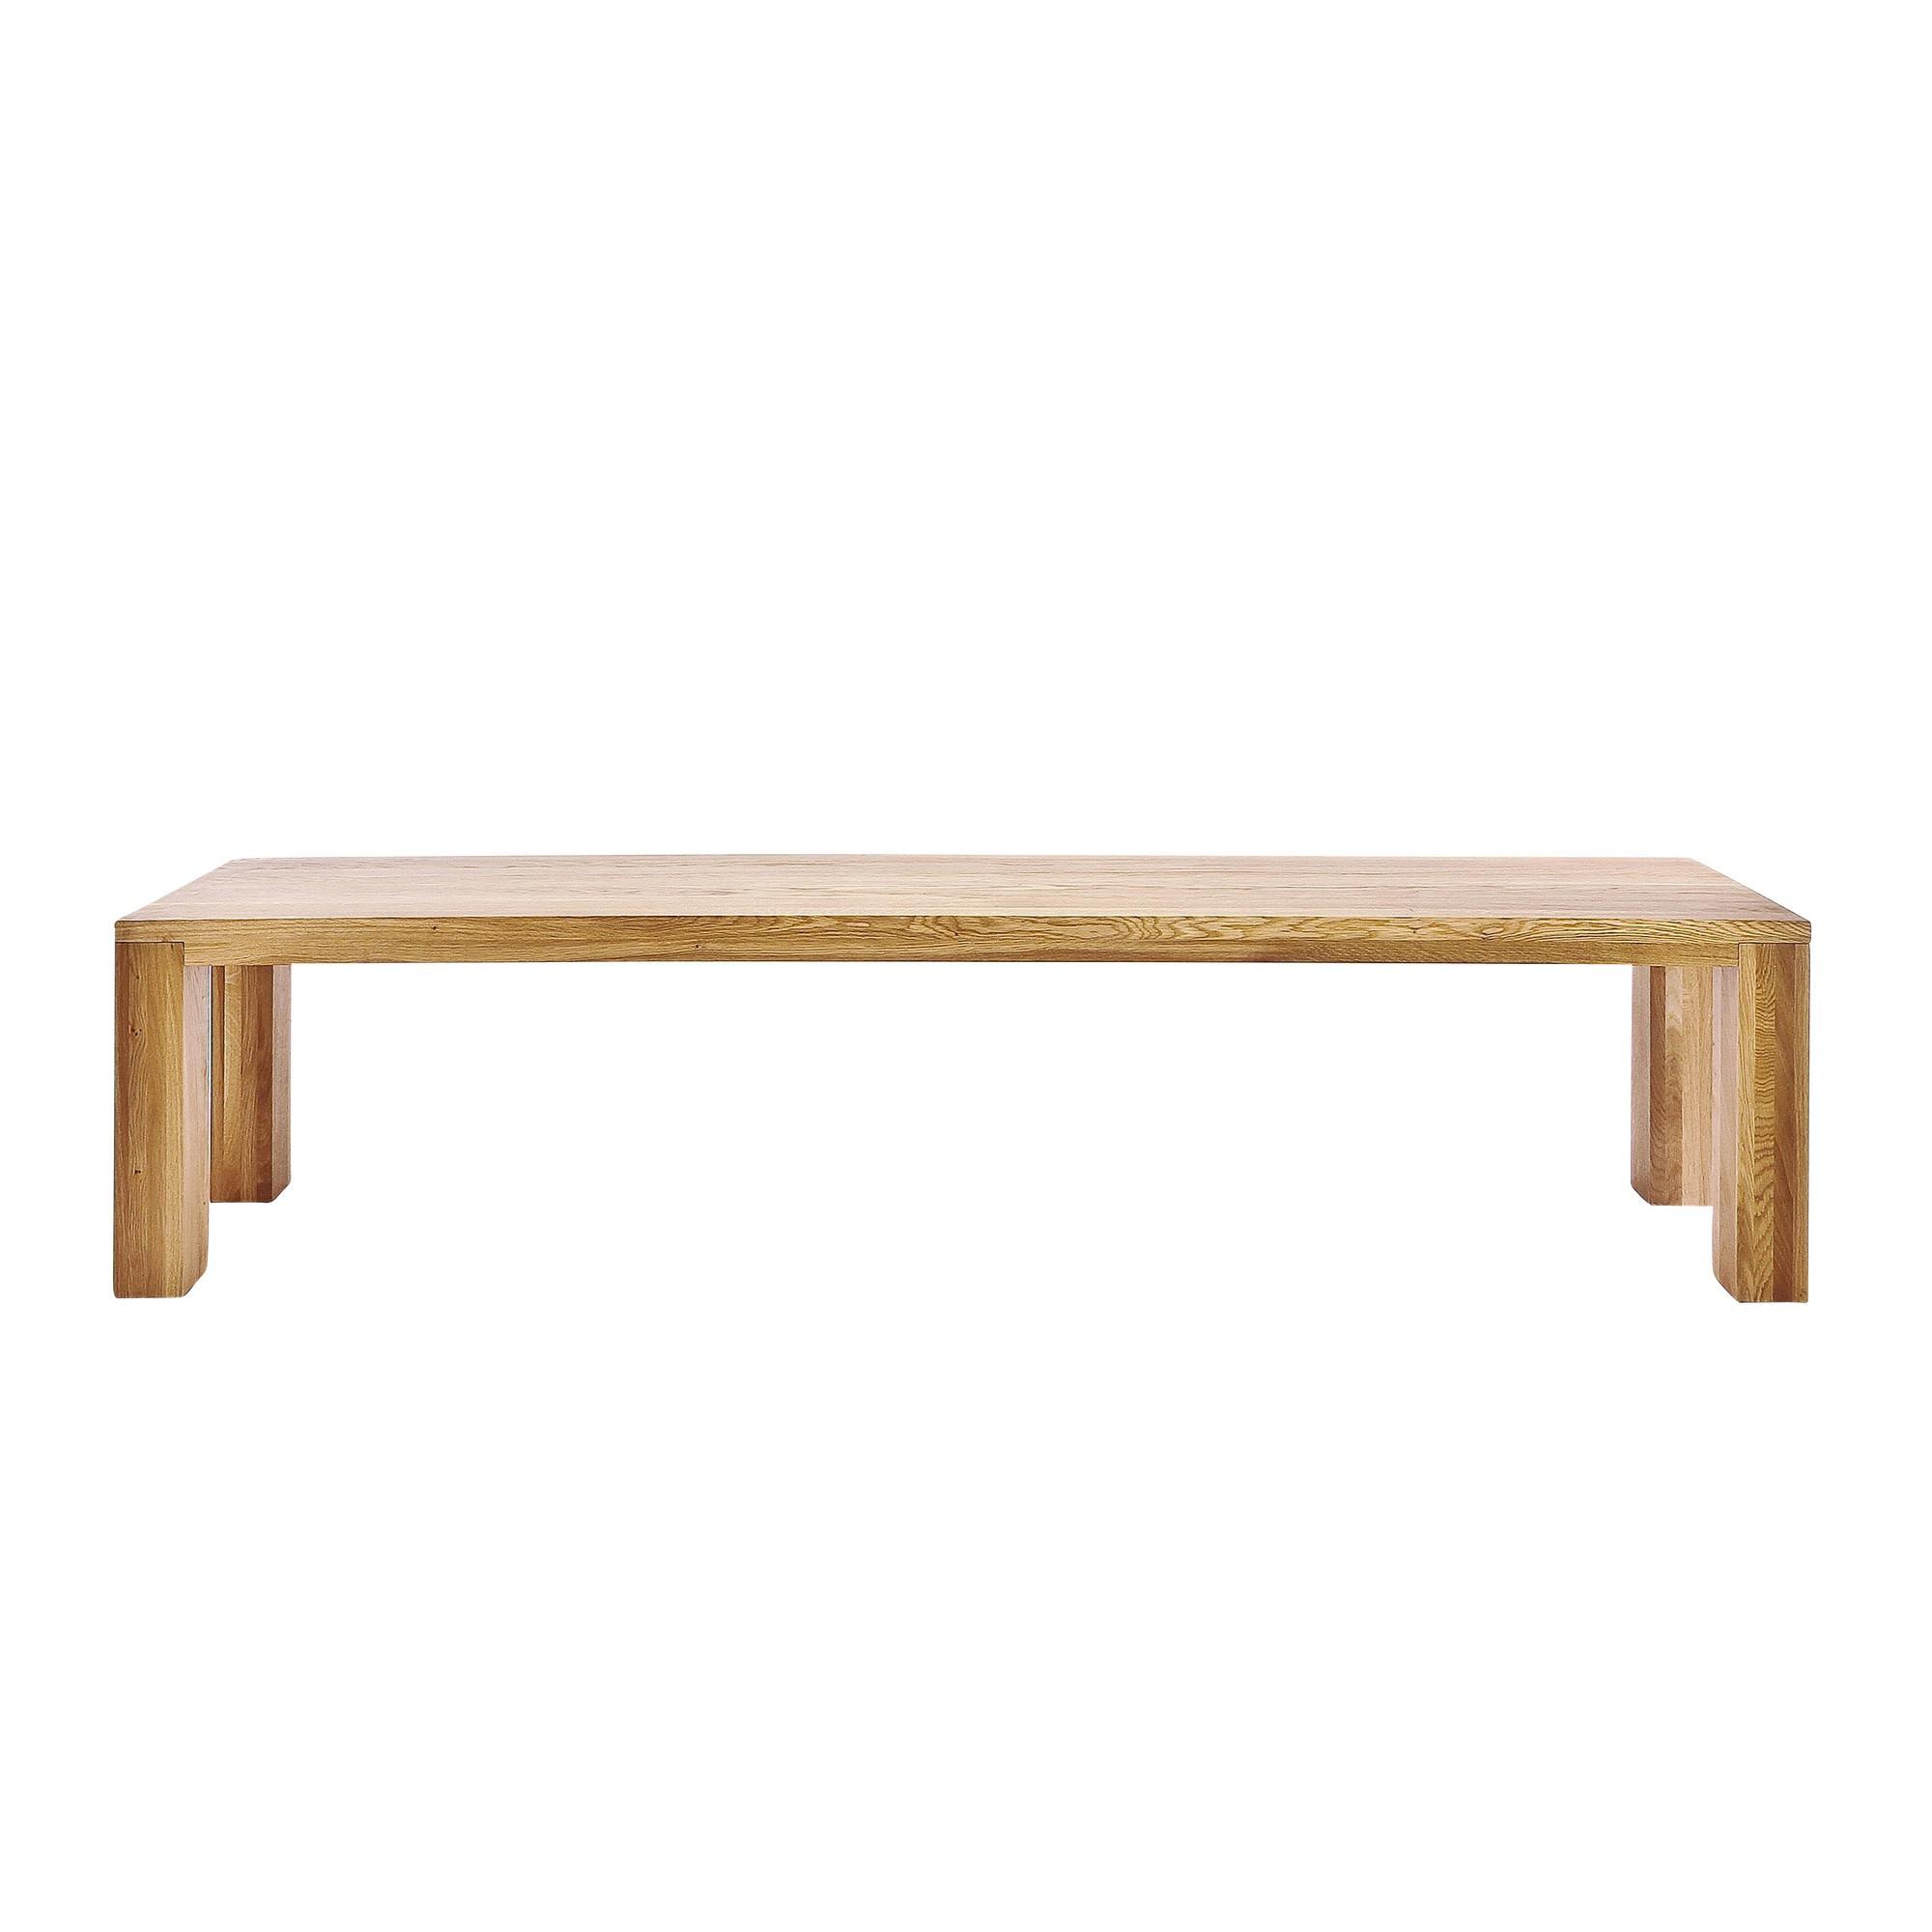 ADWOOD   Mr. Big Solid Wood Bench ...